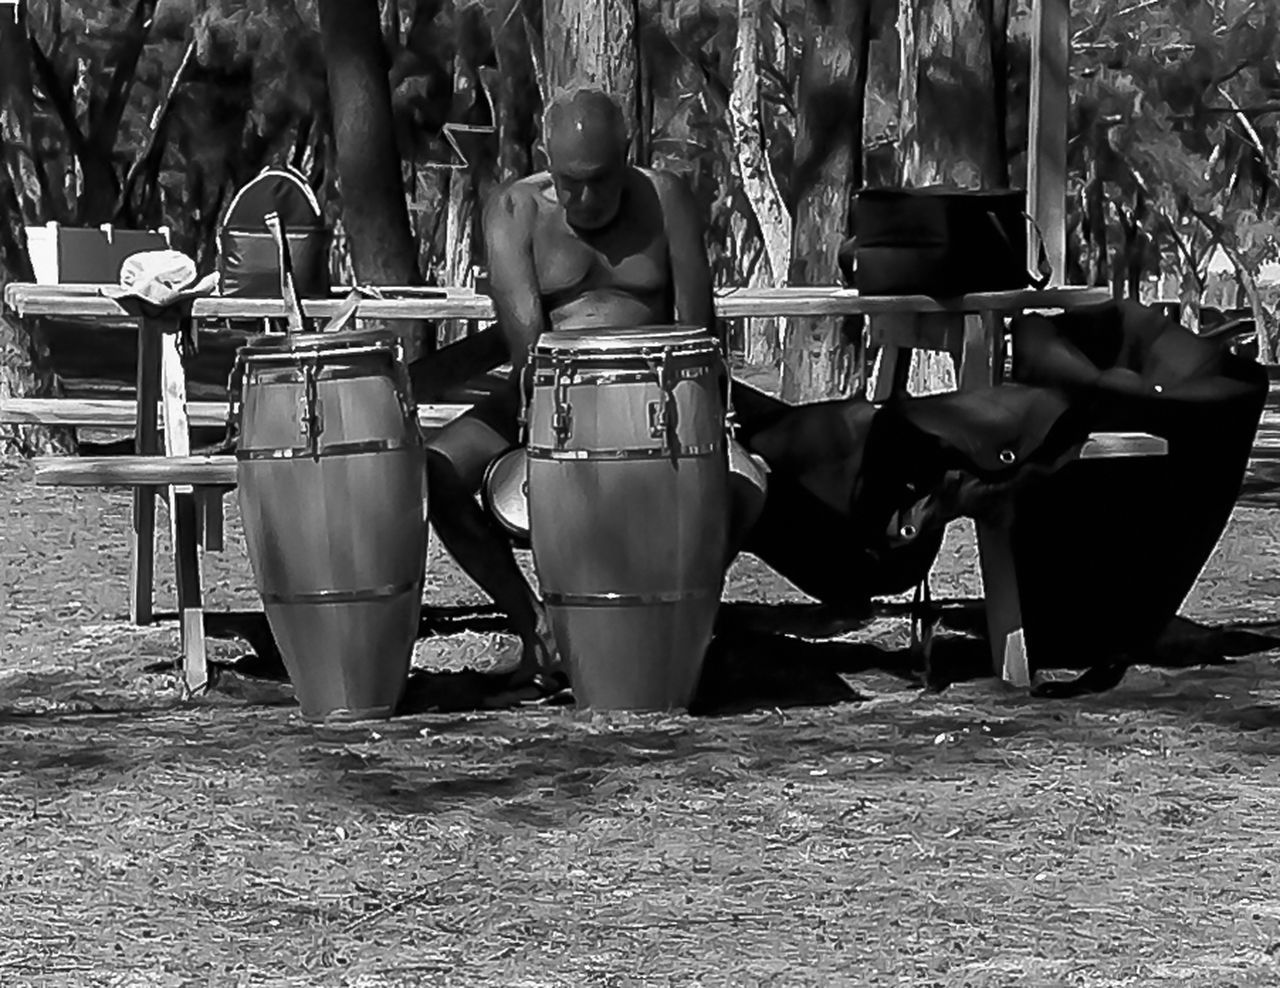 Black & White Blackandwhite Blackandwhite Photography IPhone Photography IPhoneography Street Photography Streetphoto_bw Streetphotography